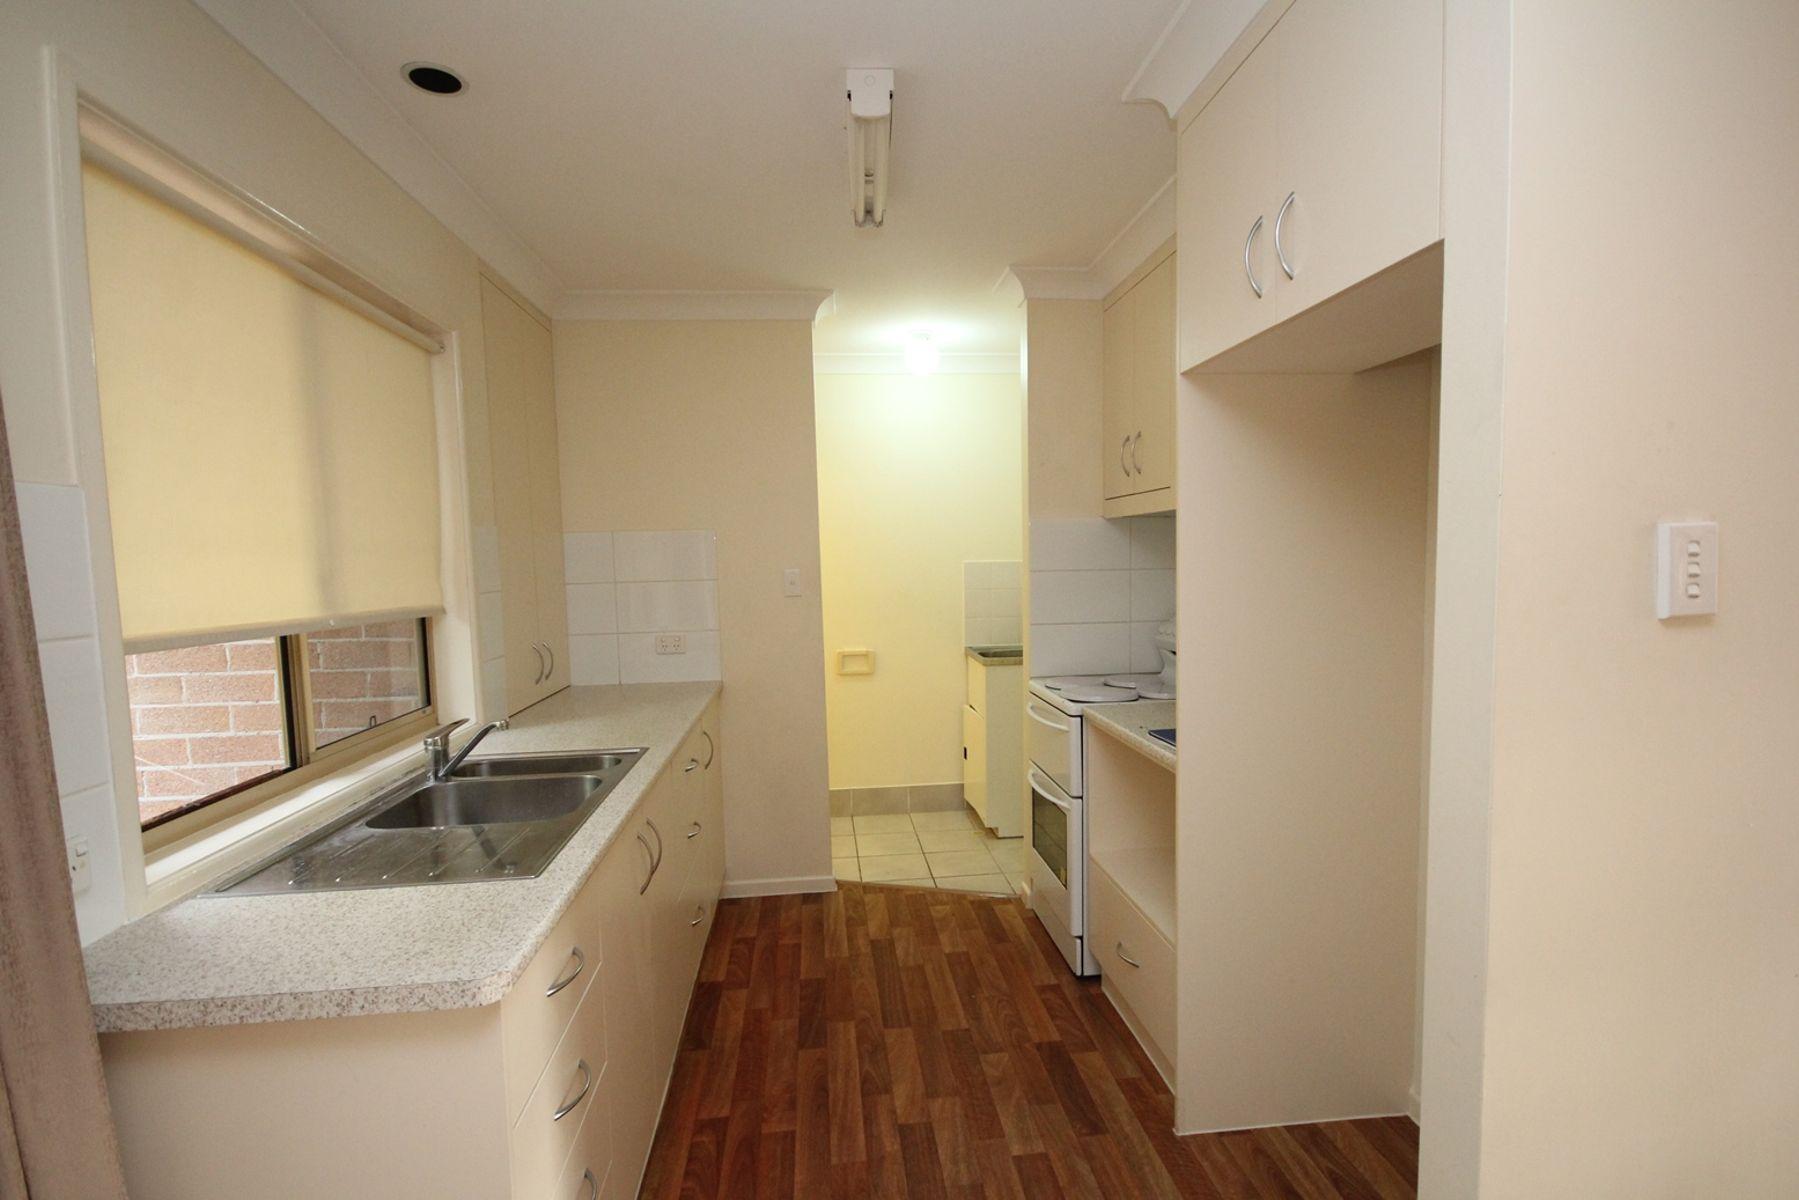 3/24 Hood Street, Sherwood, QLD 4075